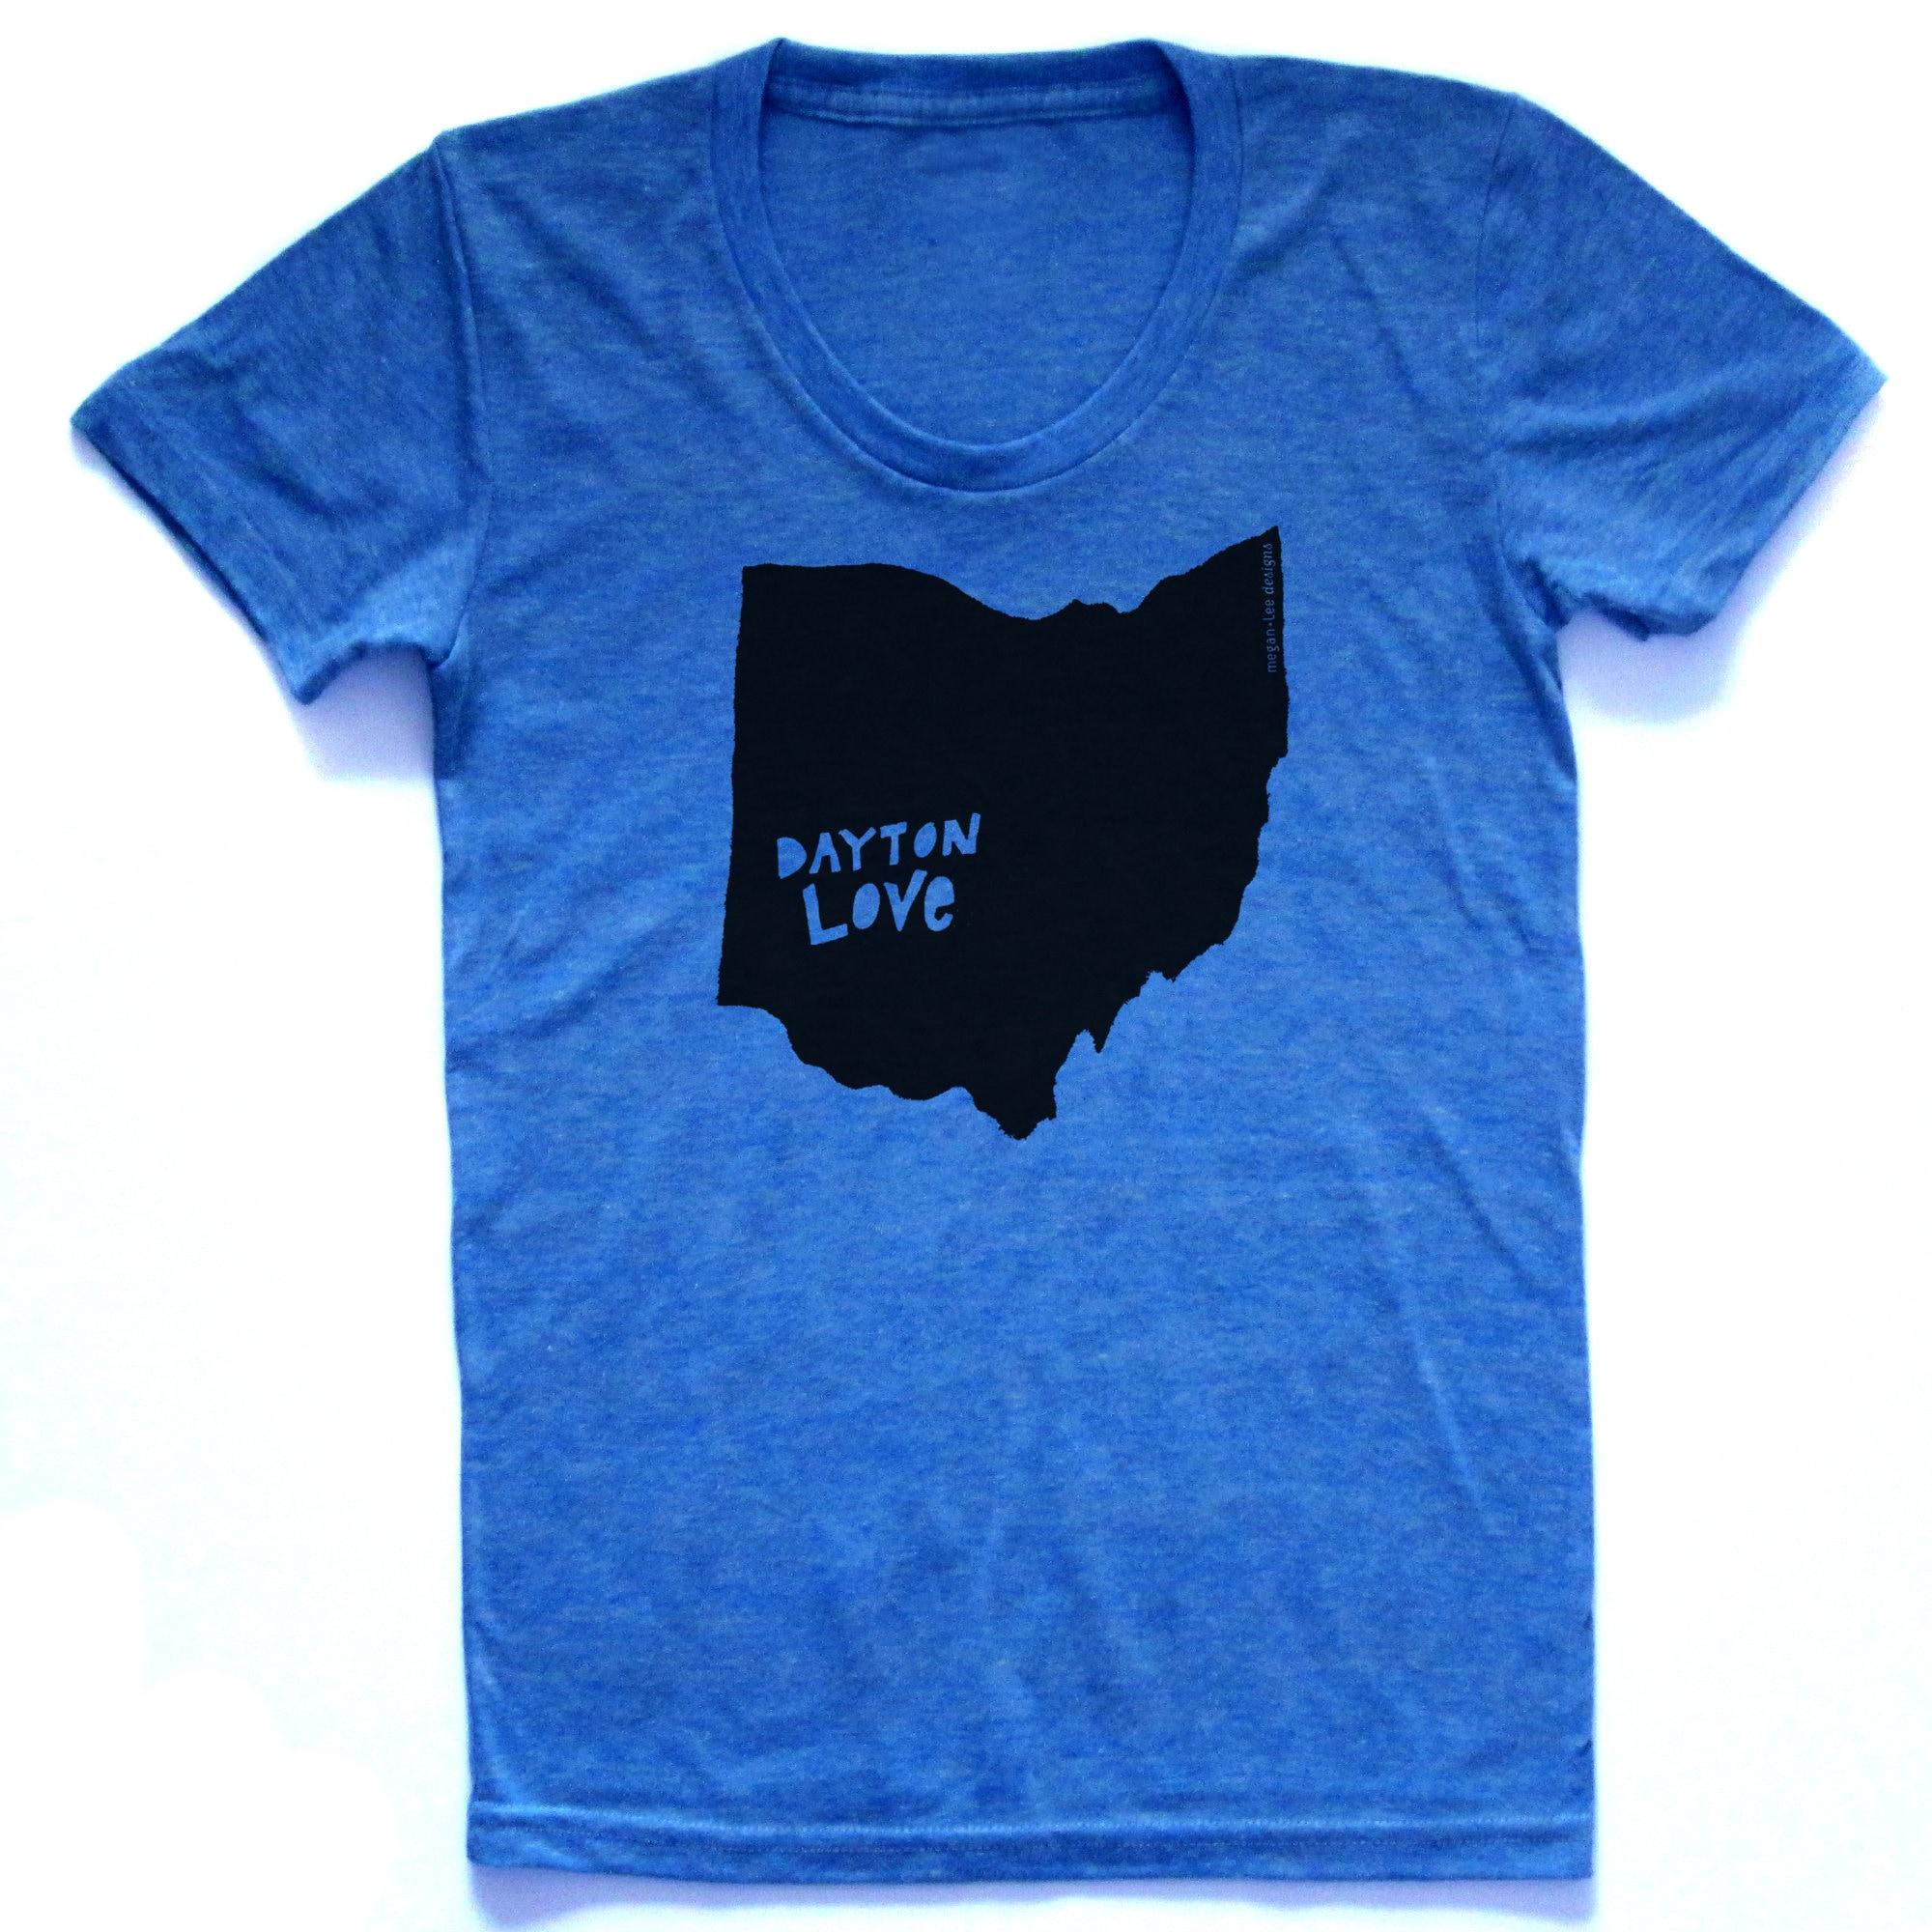 Dayton Ohio Shirt Dayton Love Tshirt Graphic T State Pride Etsy